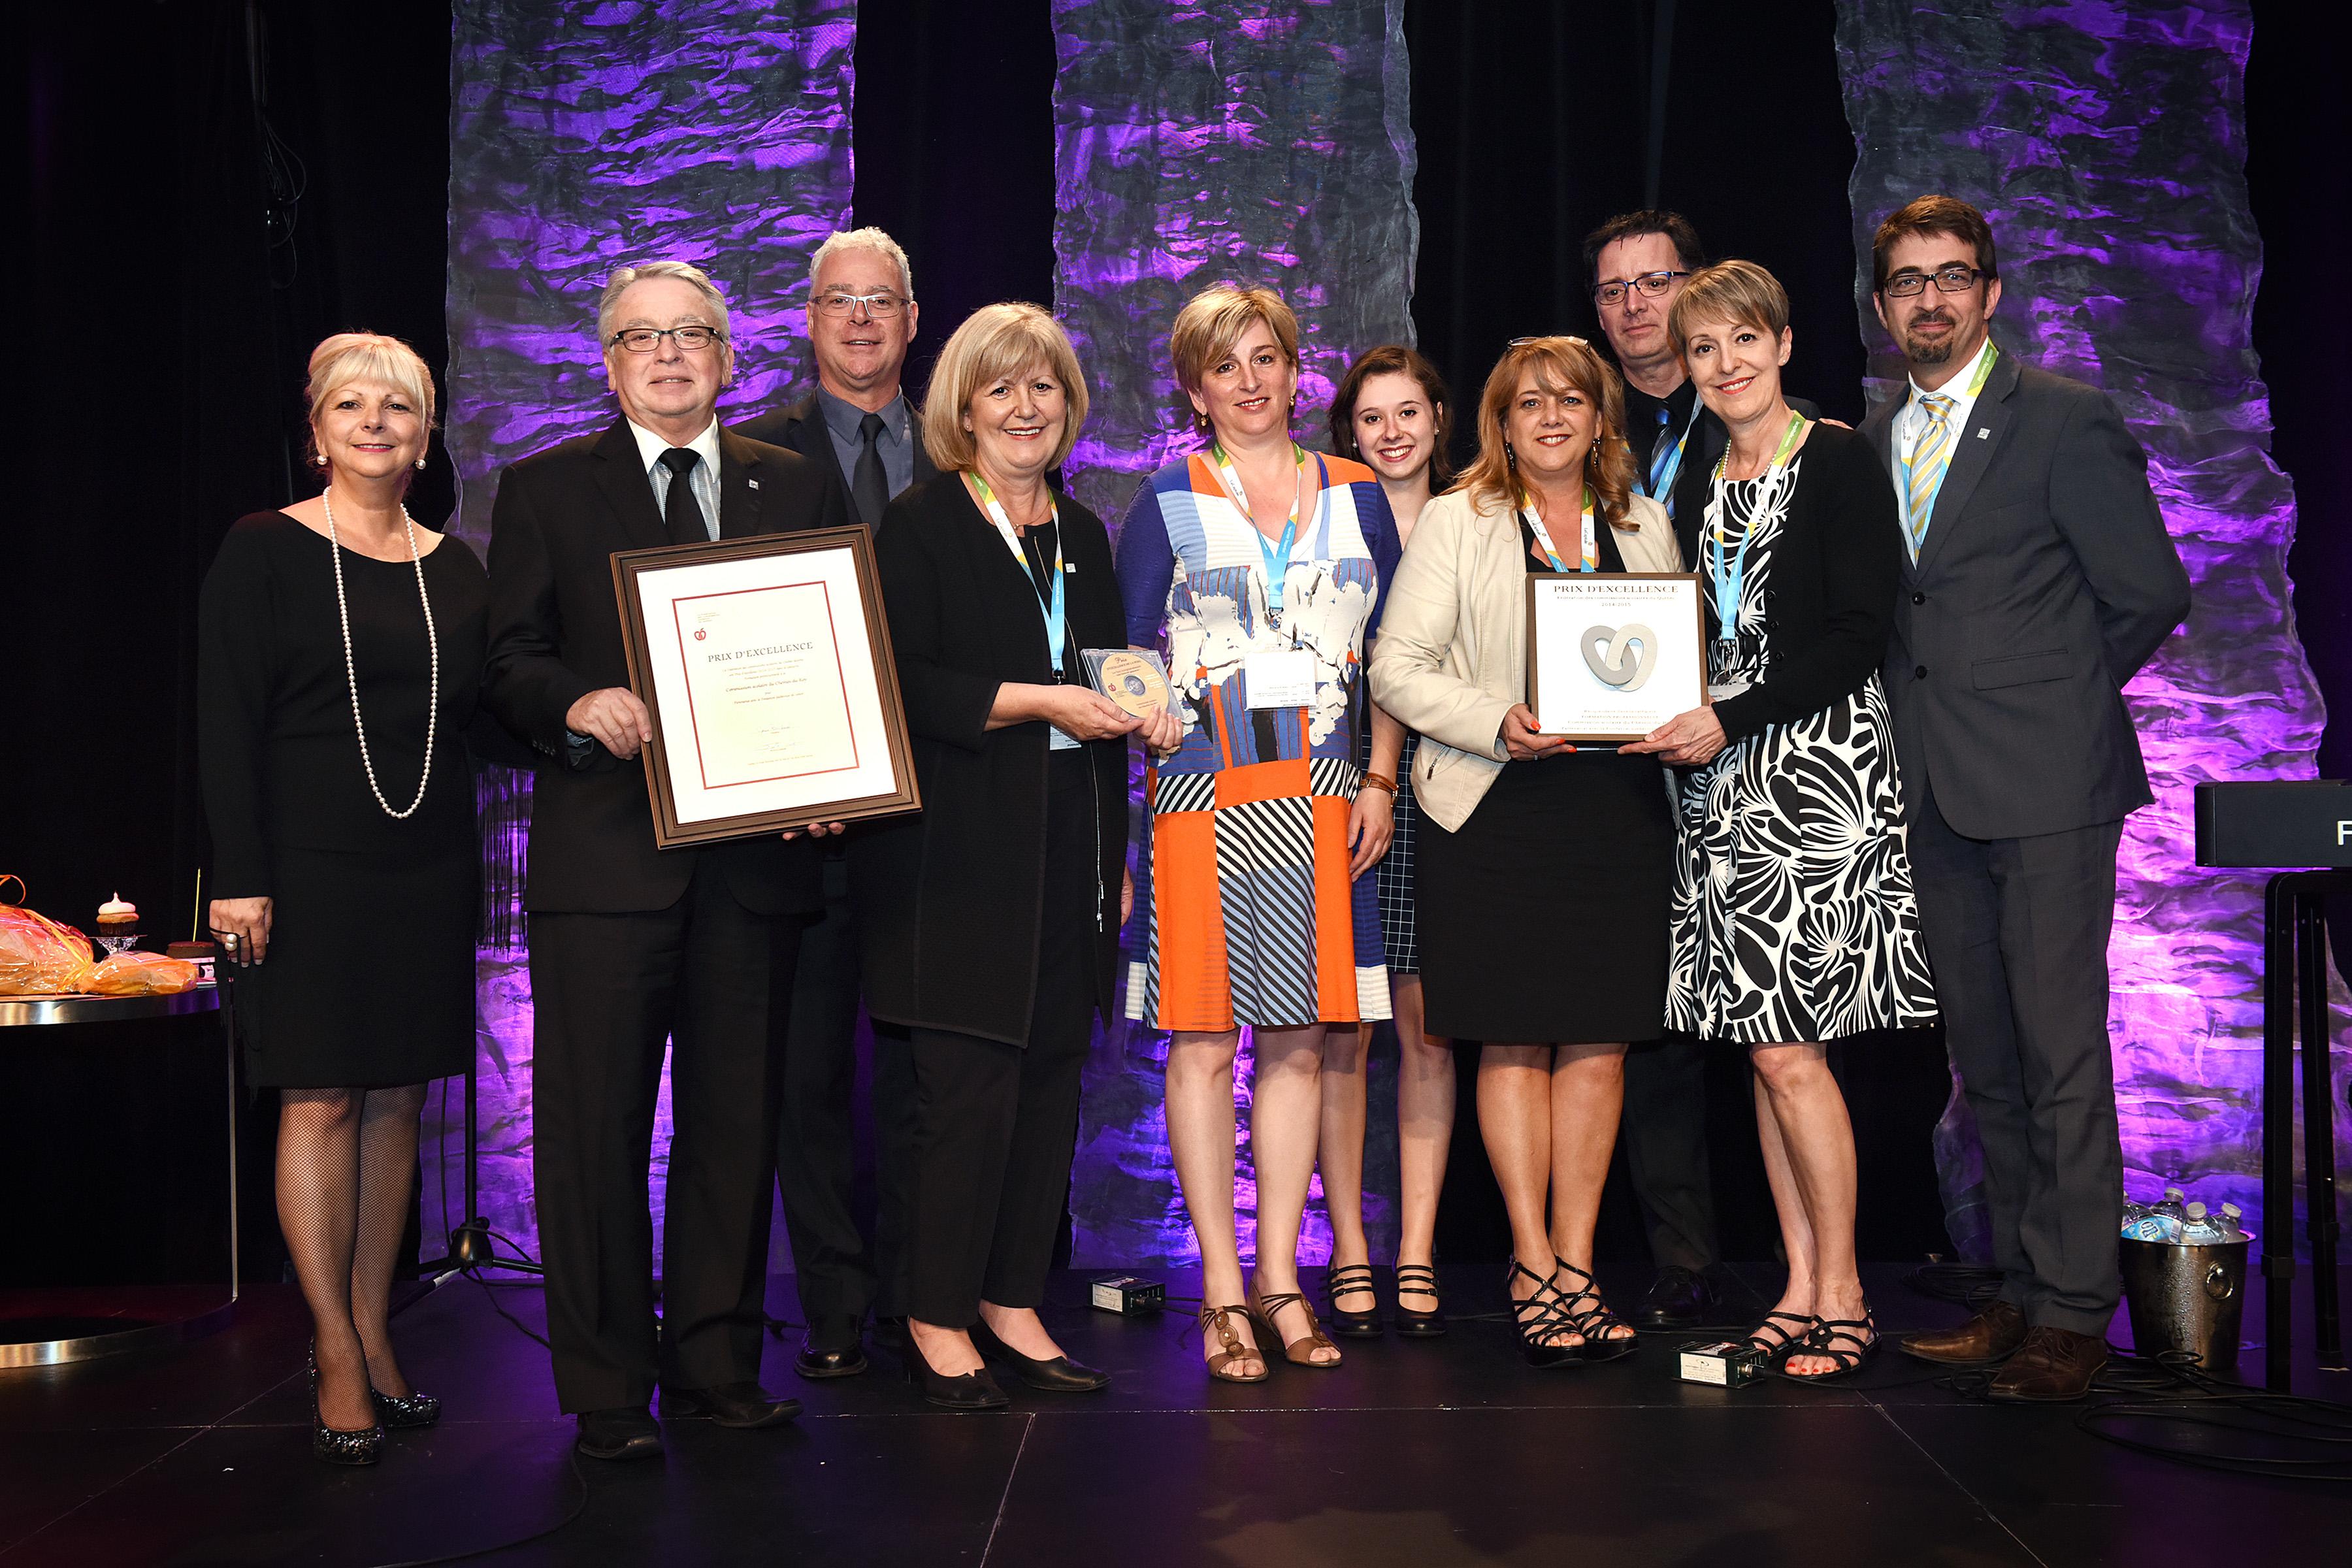 cs_chemin-roy-remise-prix-gala-2015